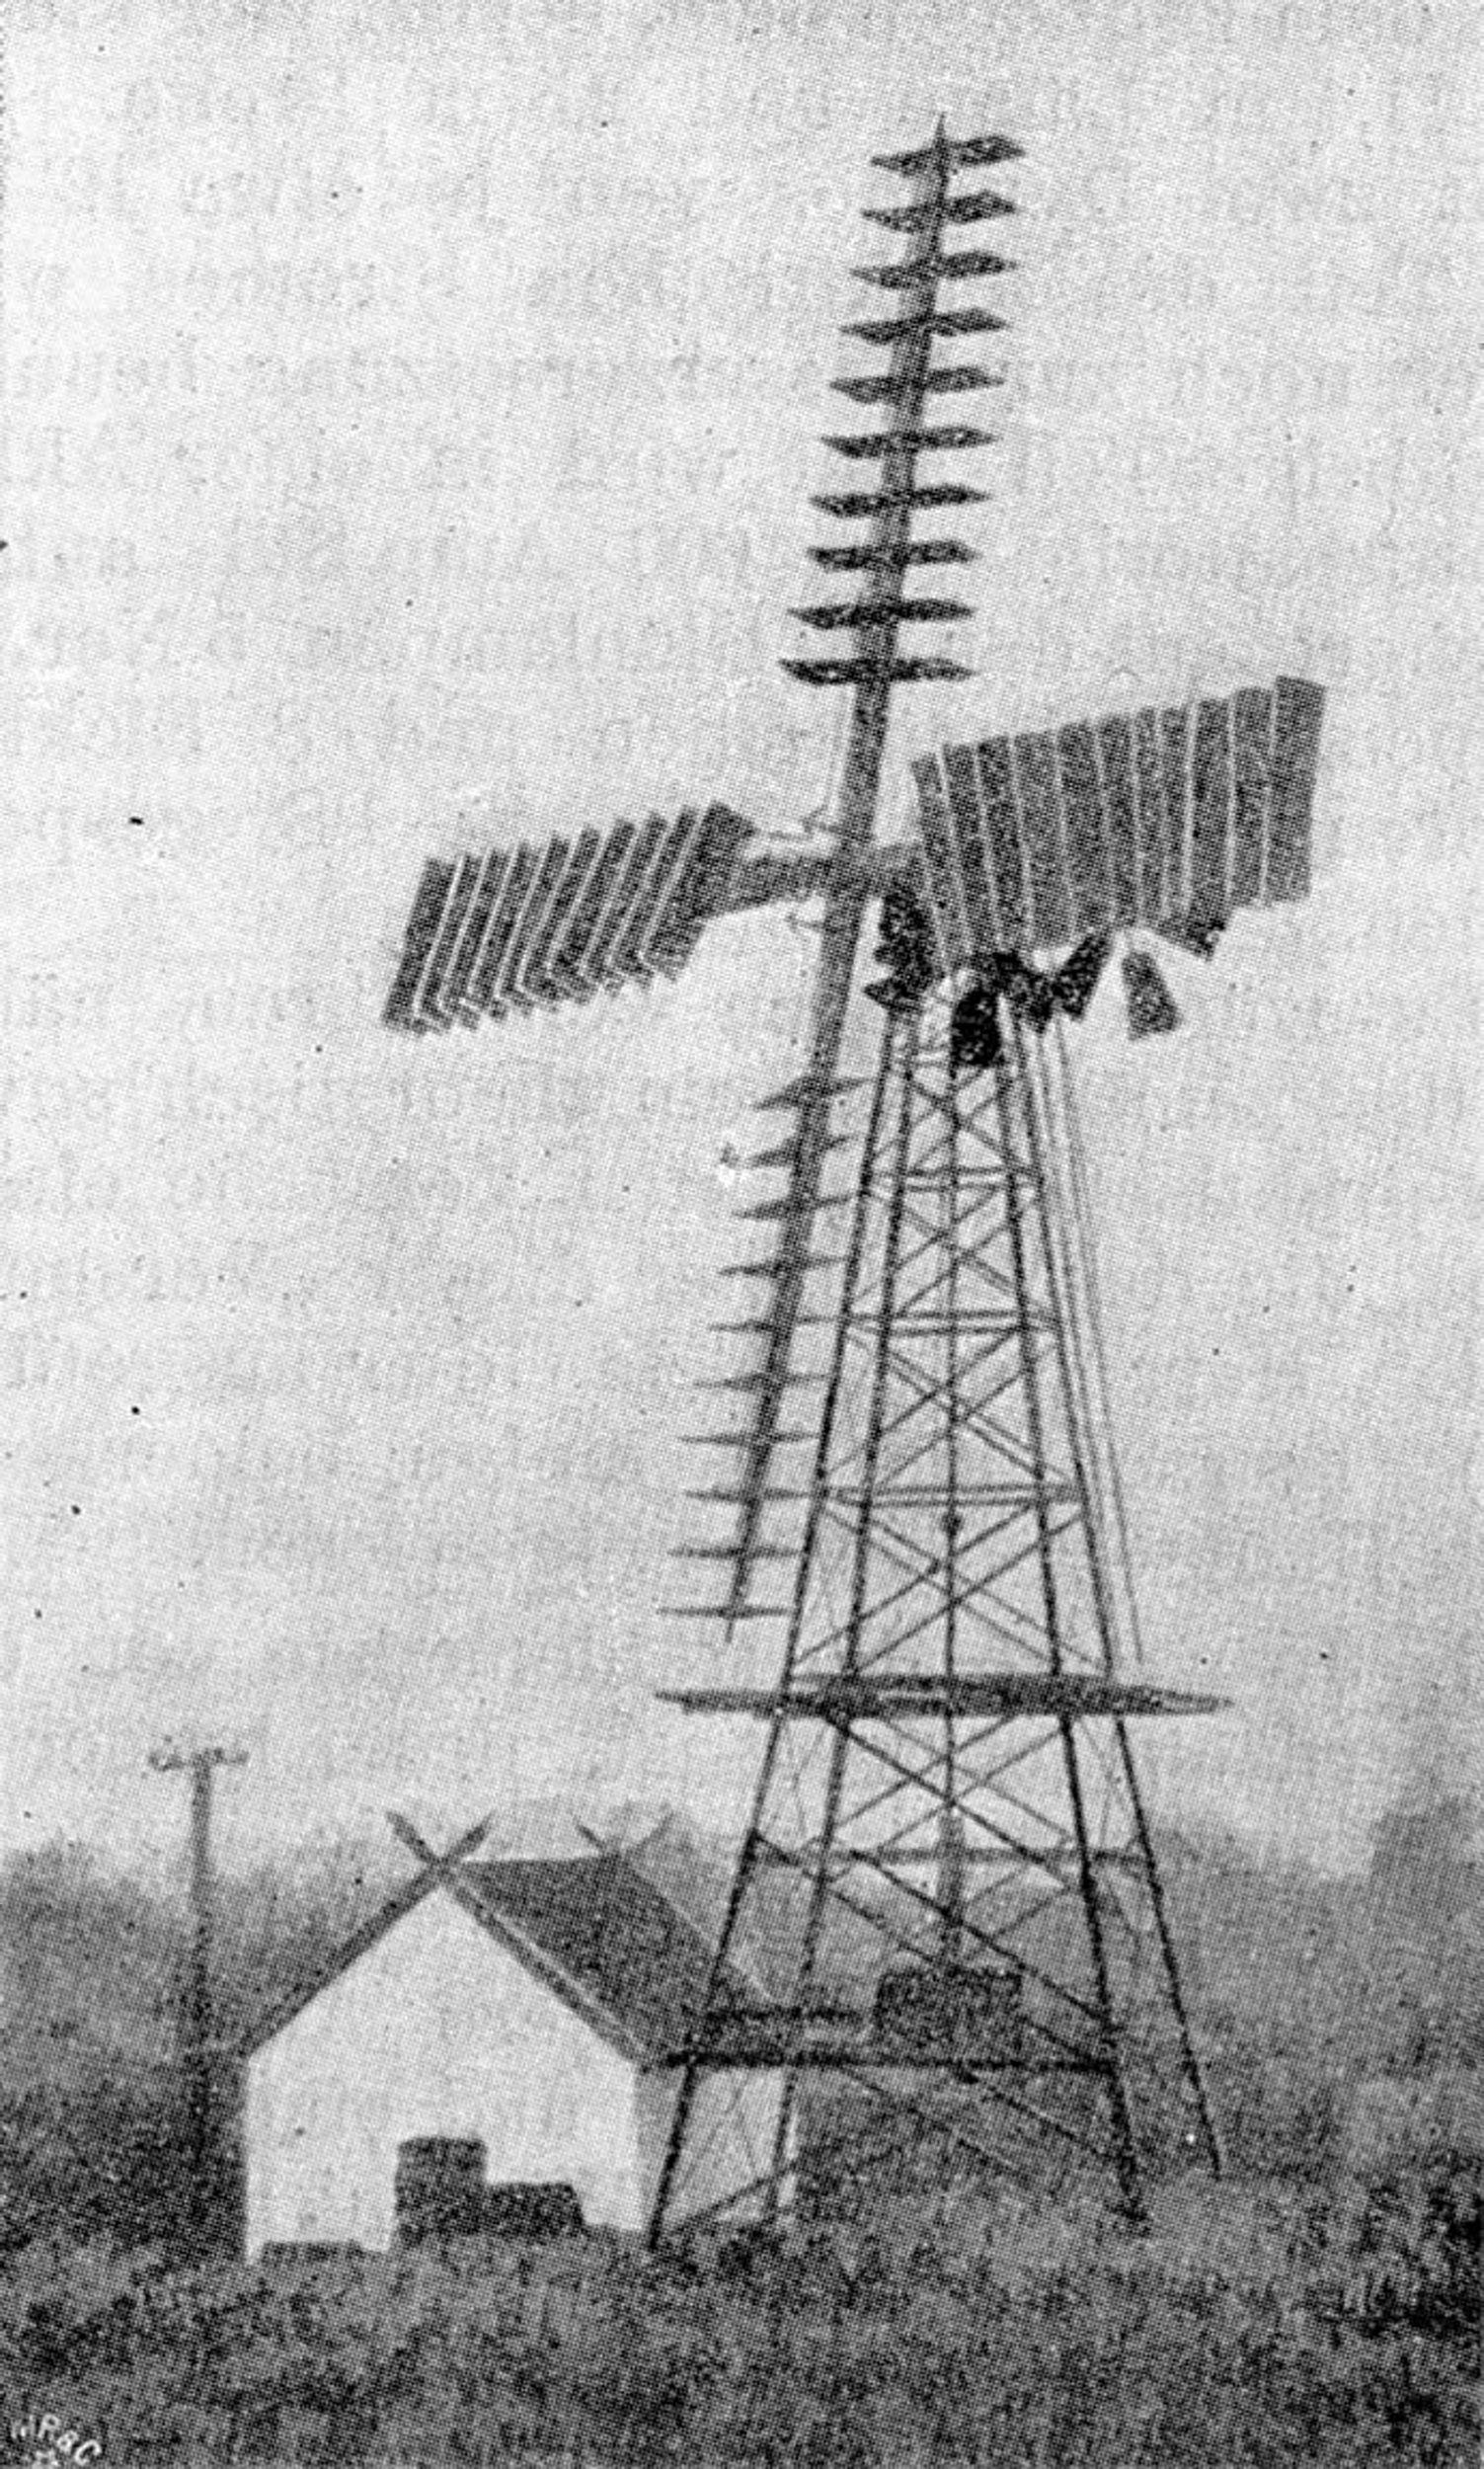 Windkraft Pioniere - Windrad in Vallekilde, Dänemark